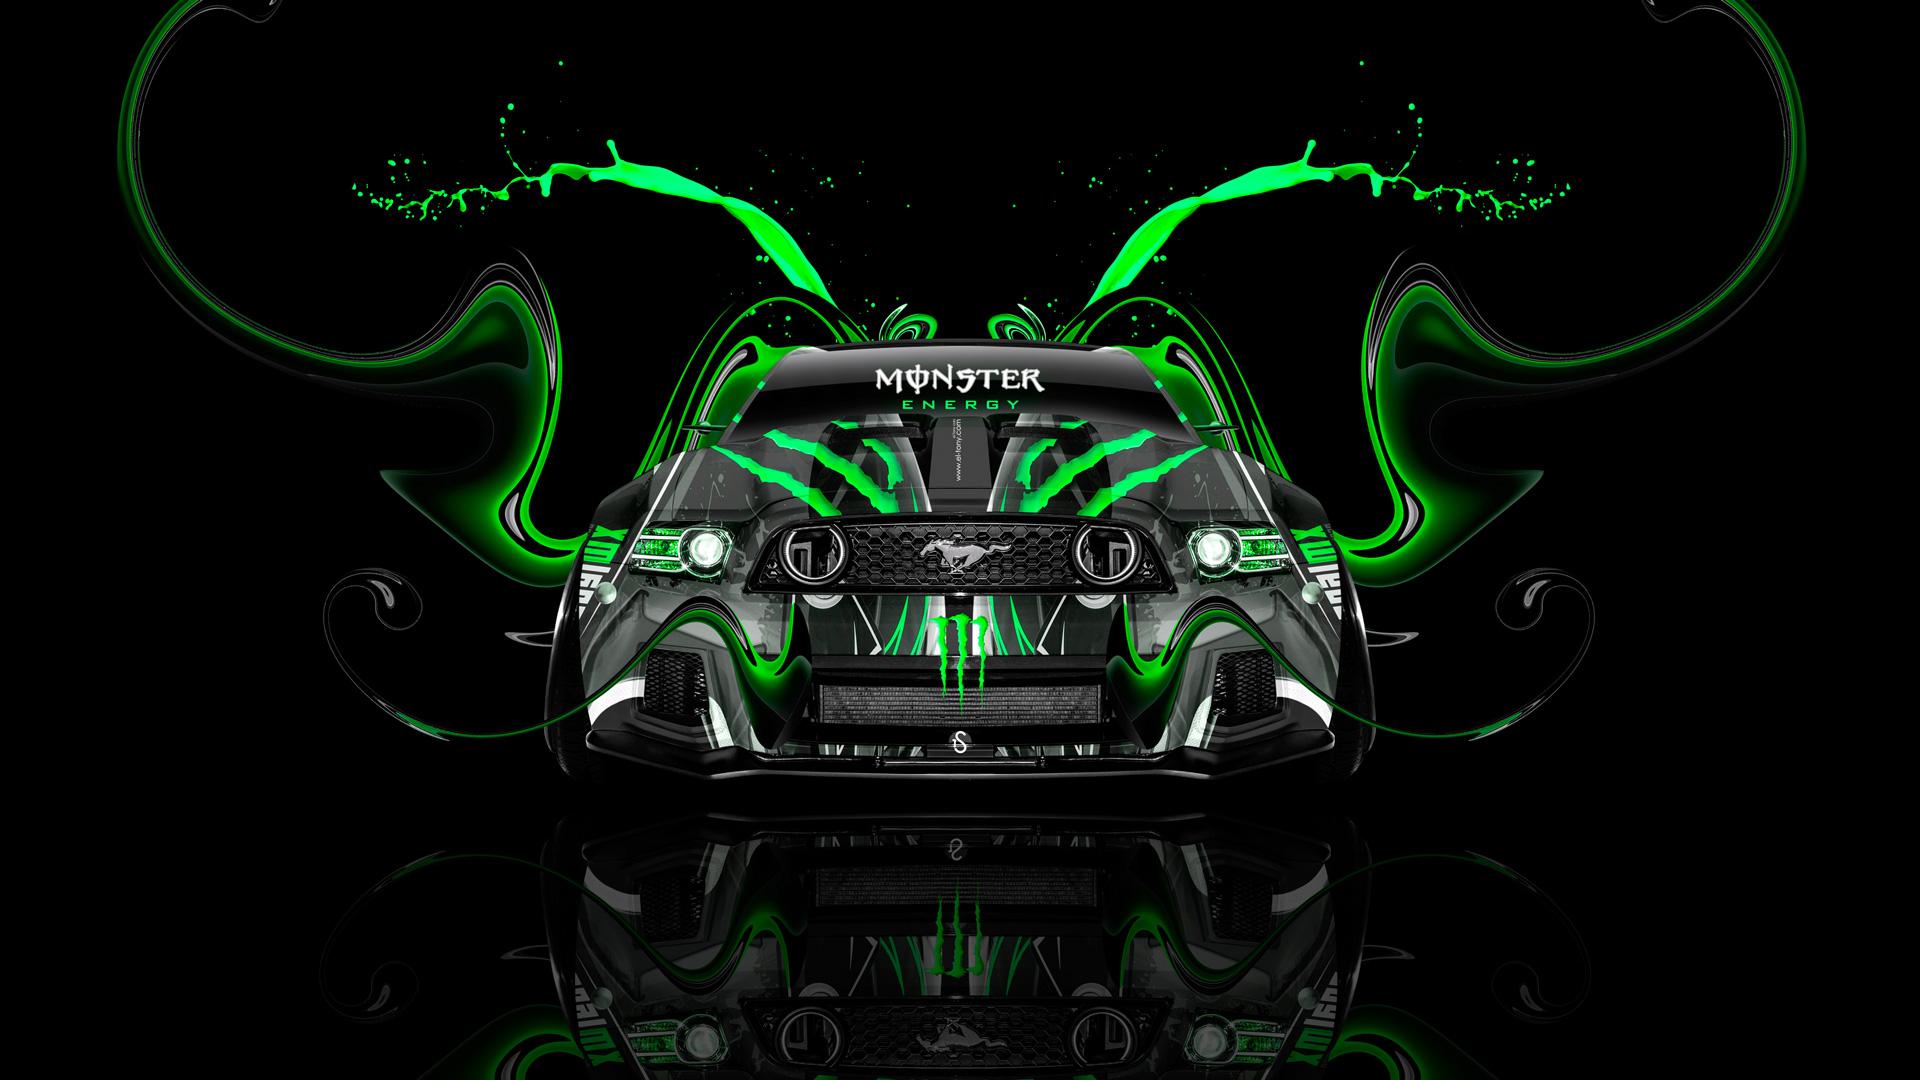 Plastic Car 2014 HD Wallpapers design by Tony Kokhan [wwwel tonycom 1920x1080